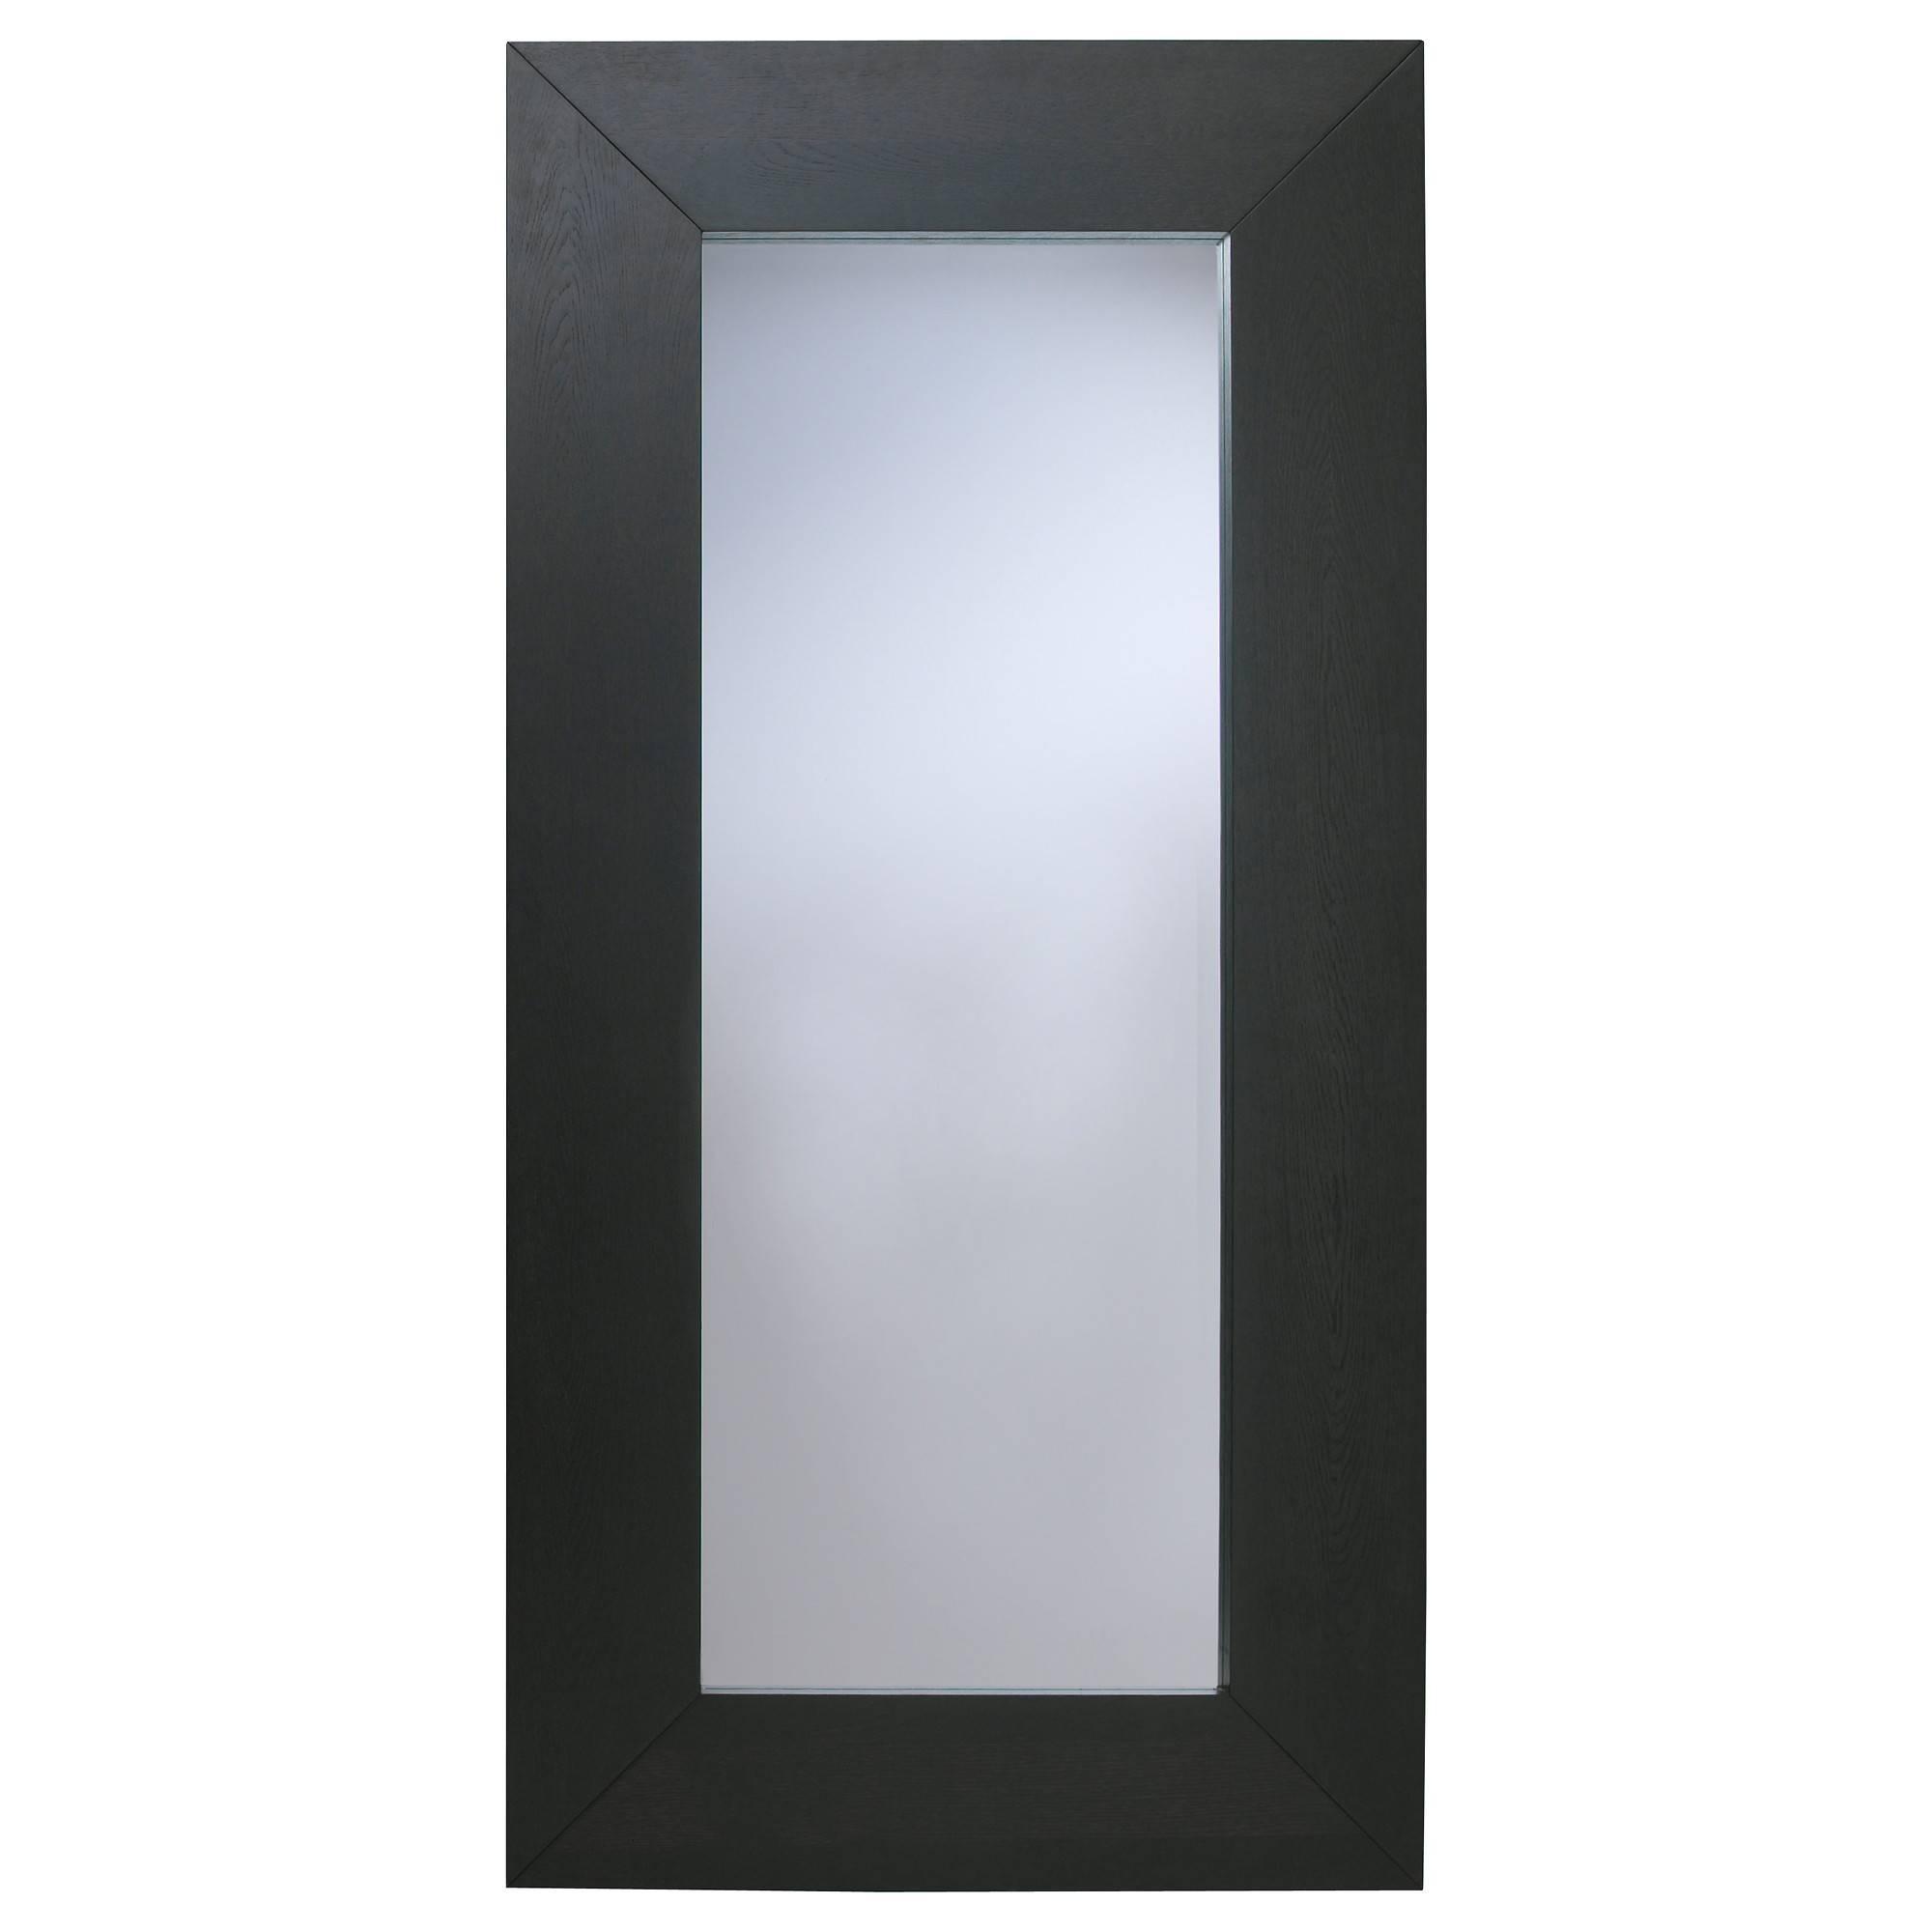 Mongstad Mirror Black-Brown 94X190 Cm - Ikea regarding Black Mirrors (Image 8 of 15)